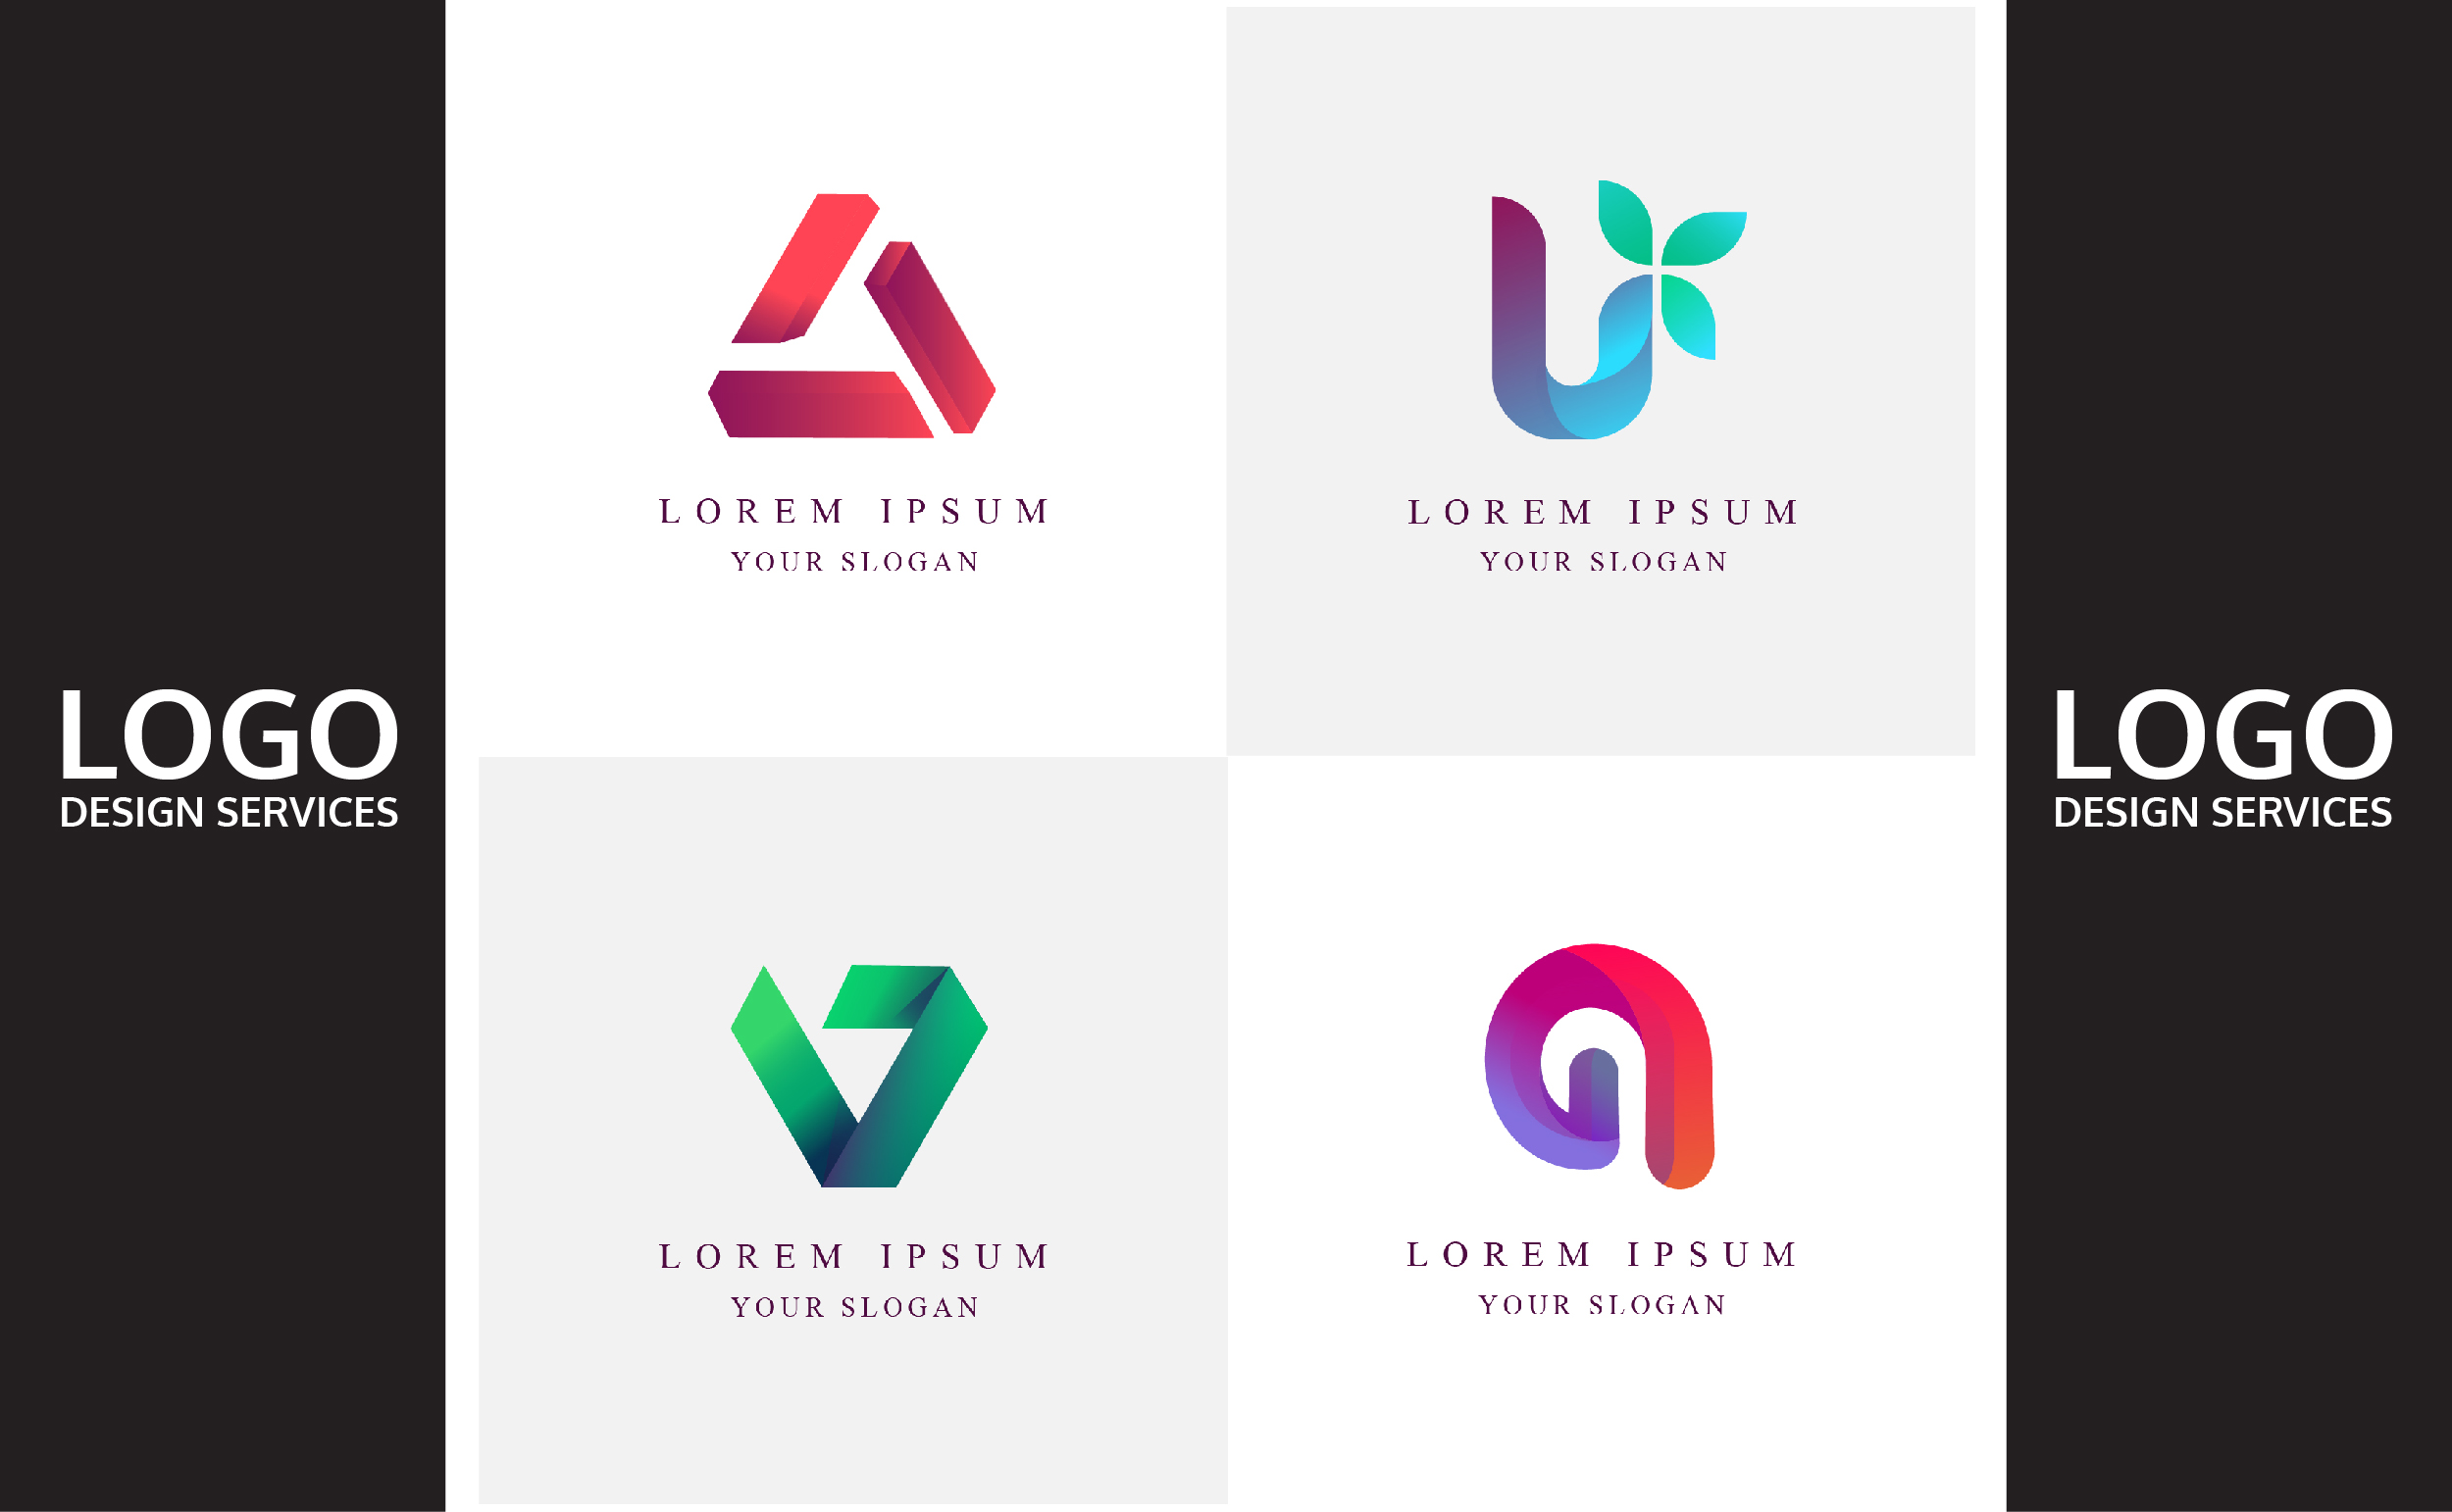 I will design business minimalist logo design